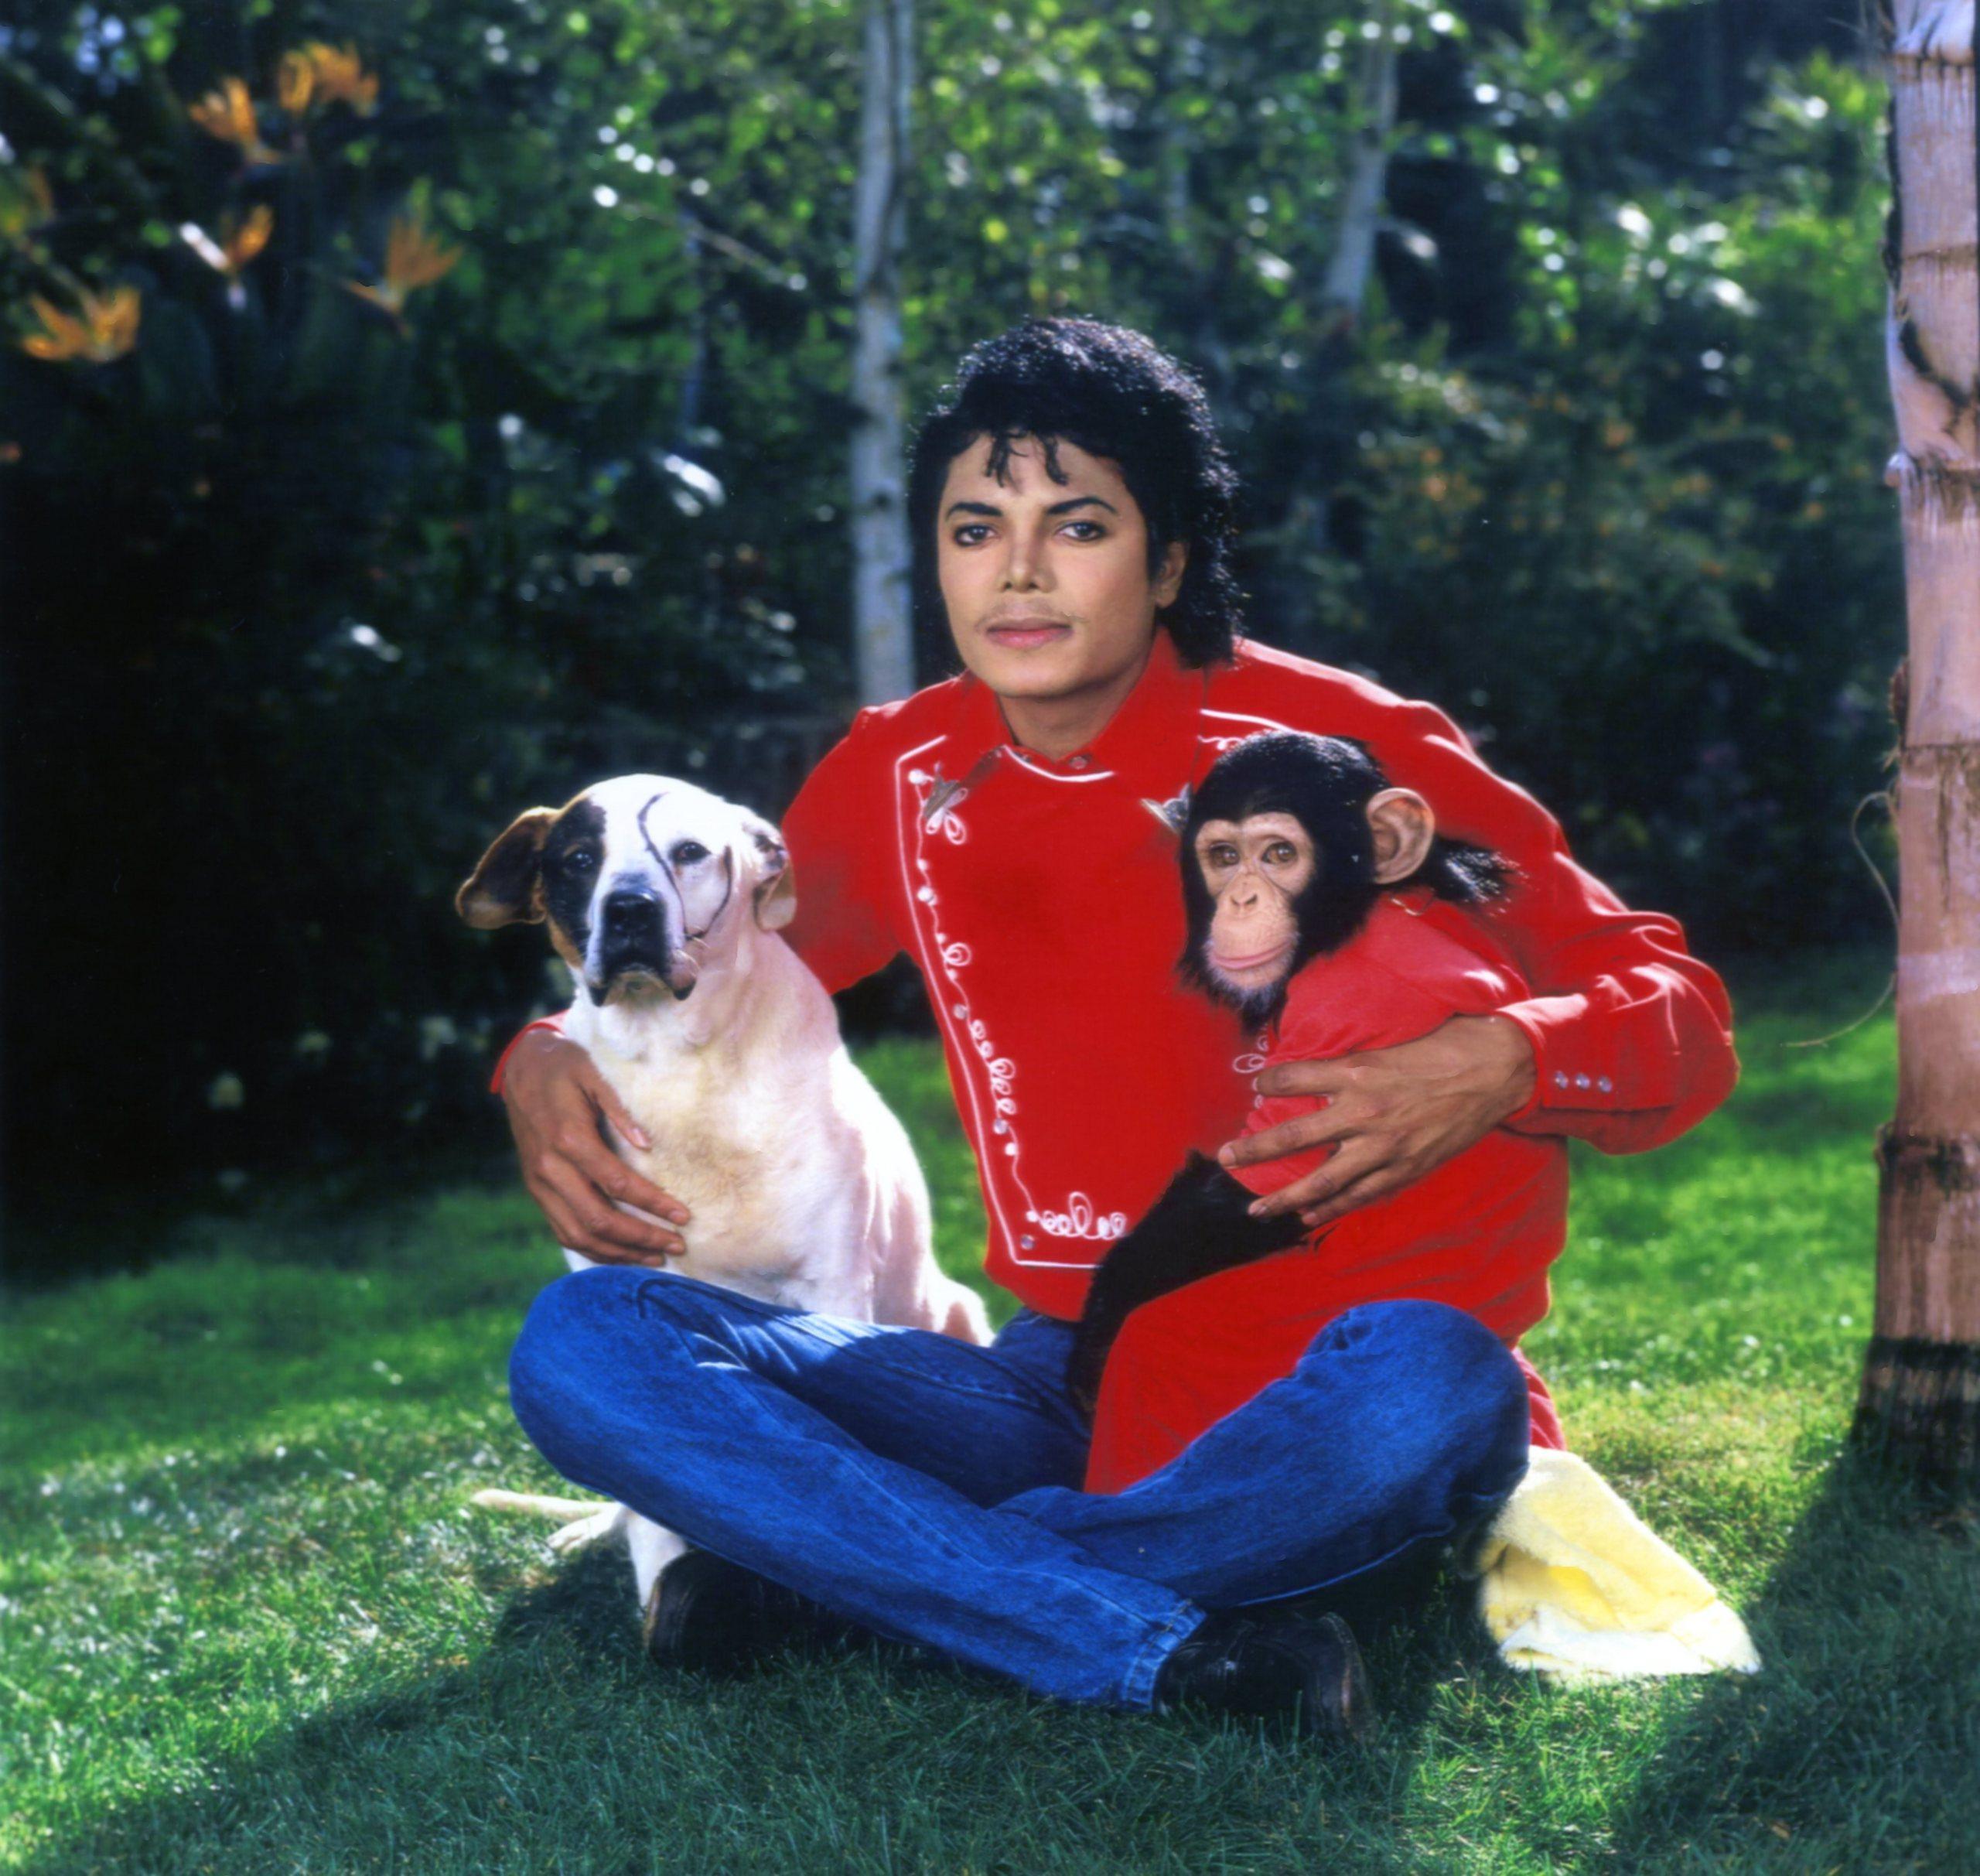 DIA DE LA TIERRA HOMENAJE PARA MIKE - Página 2 MJ-with-animals-michael-jackson-11640714-2560-2425